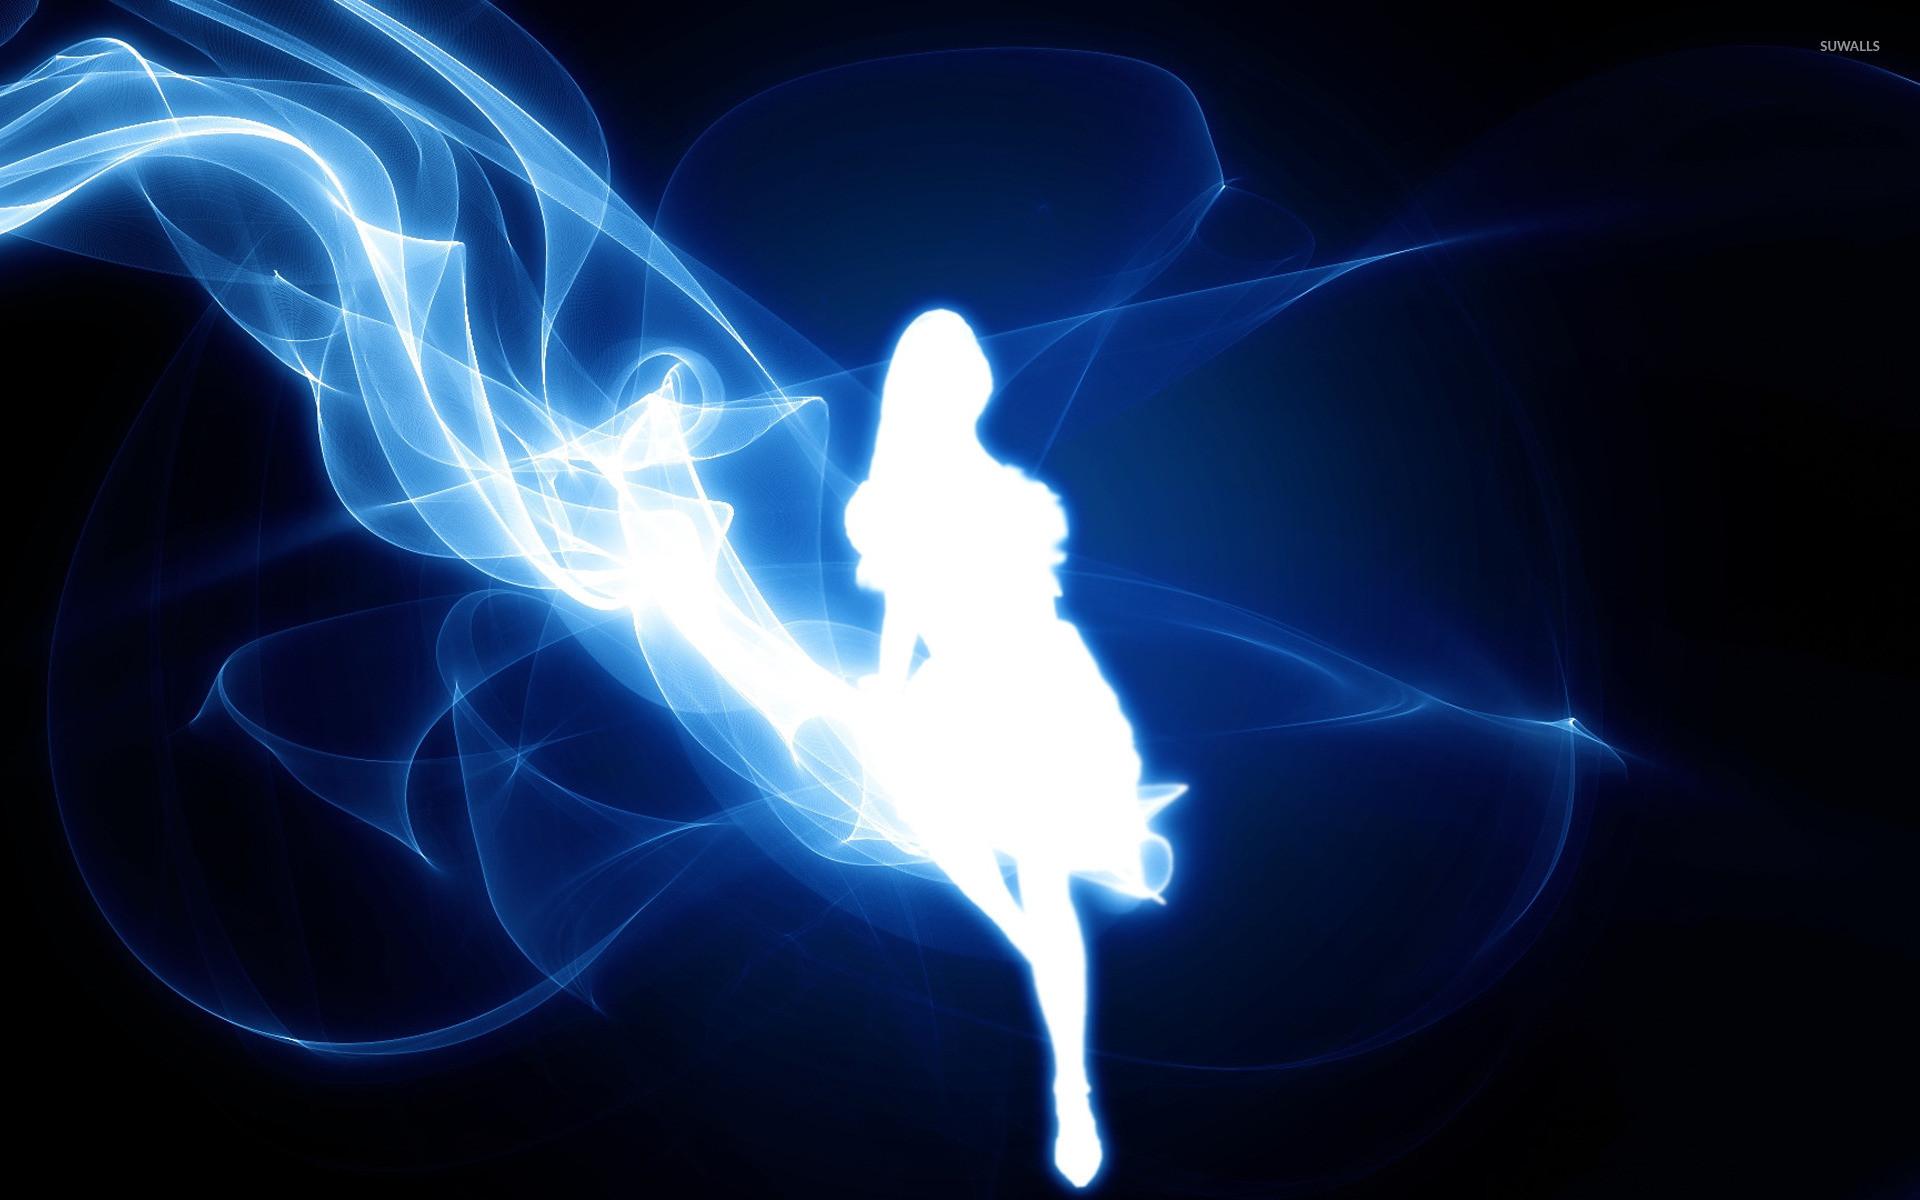 Smoke Fairy wallpaper